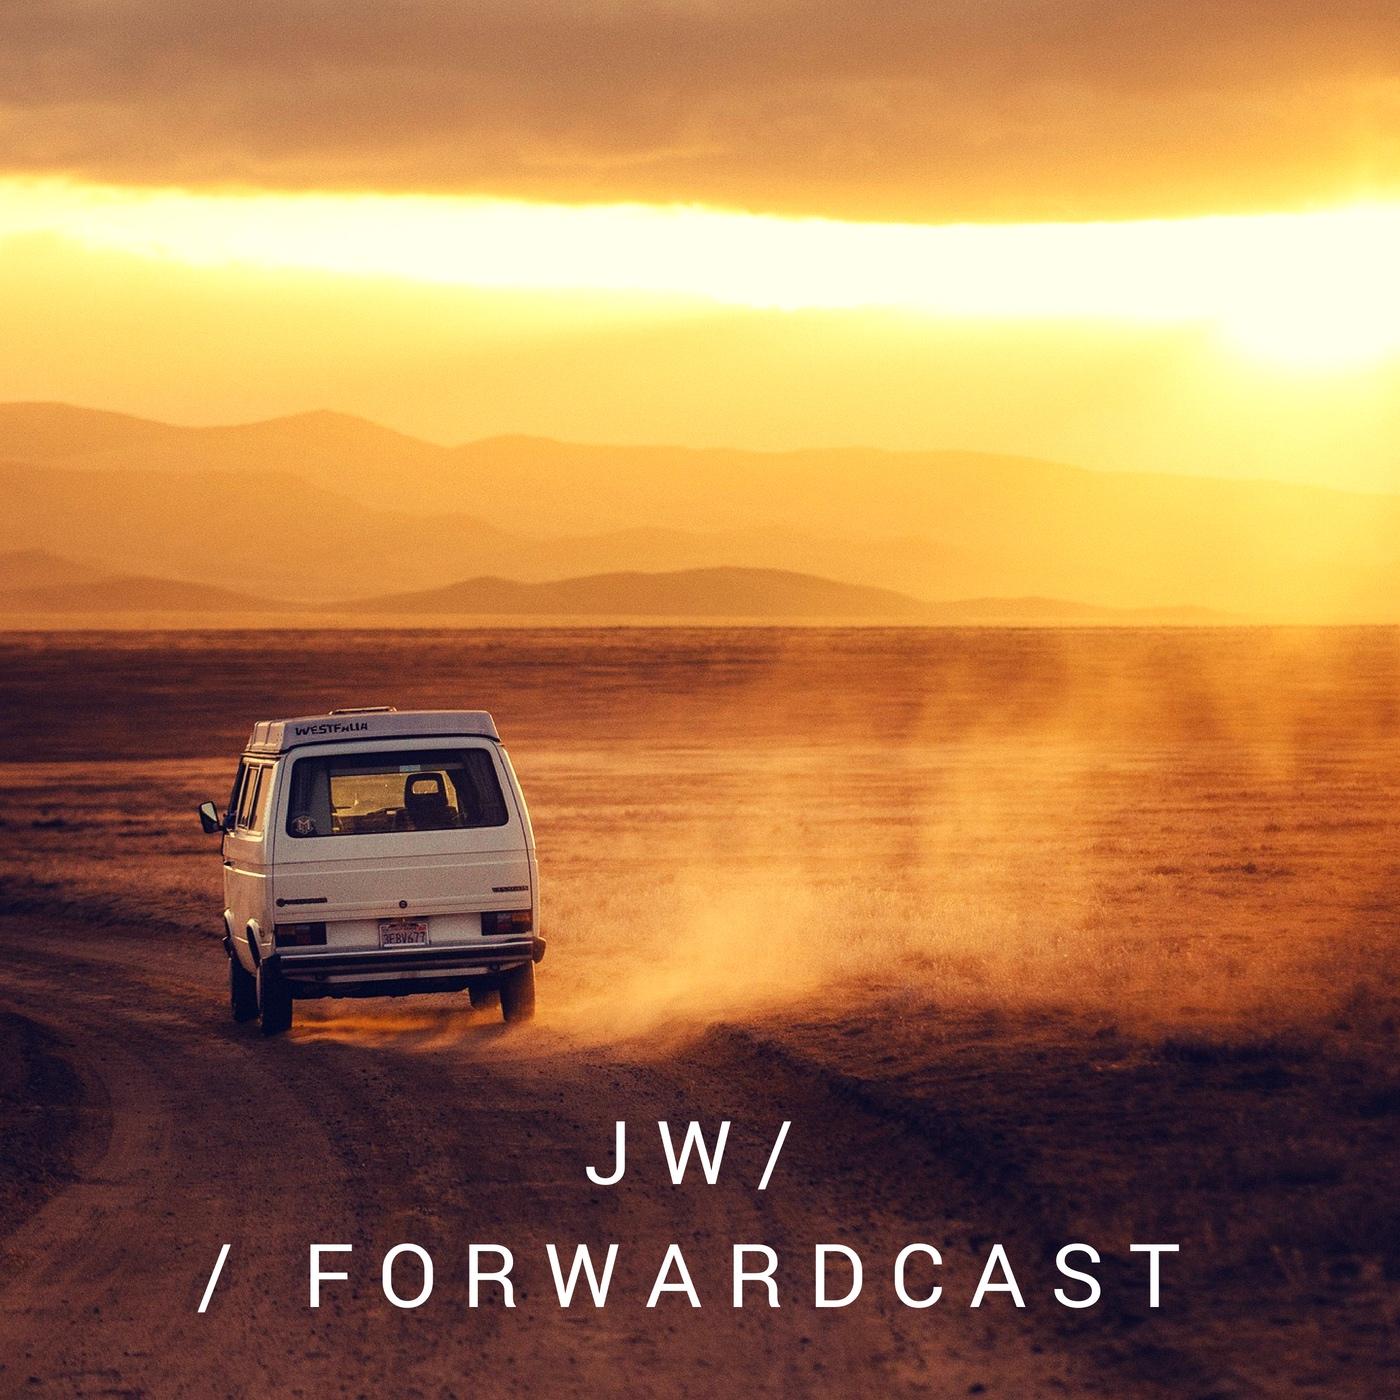 jwforwardcast